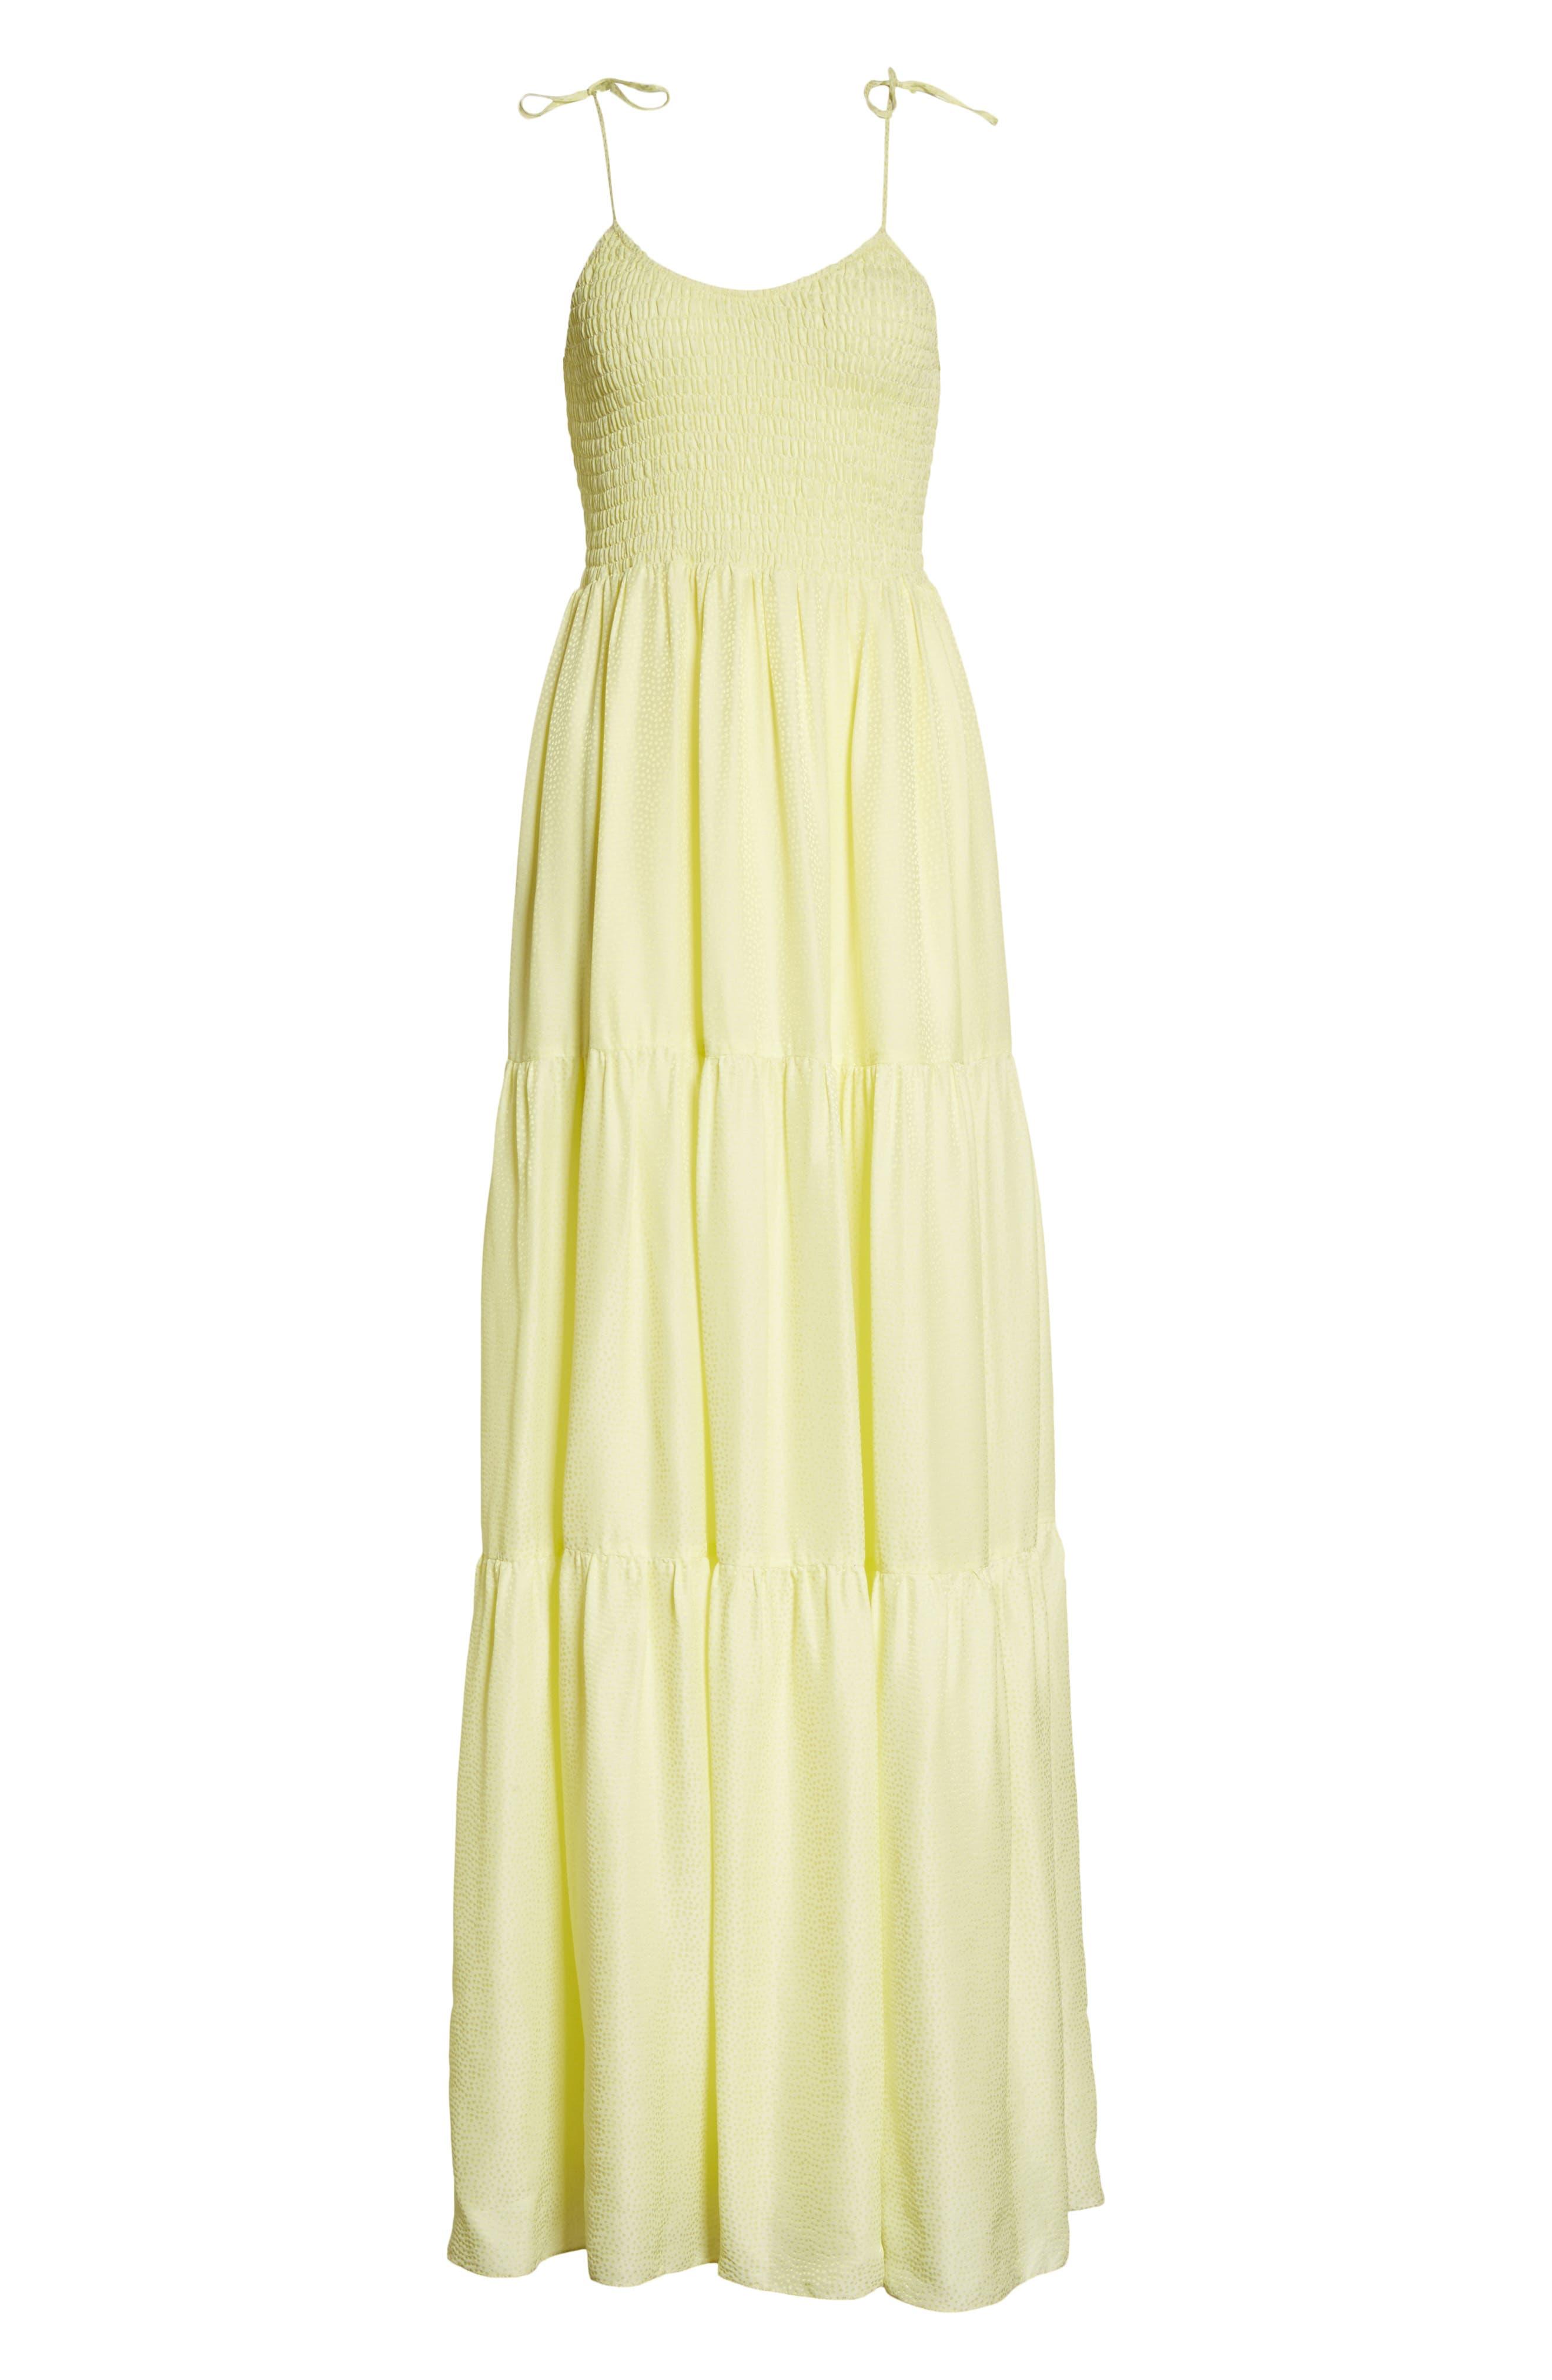 Prose & Poetry Inaya Maxi Dress,                             Alternate thumbnail 6, color,                             741